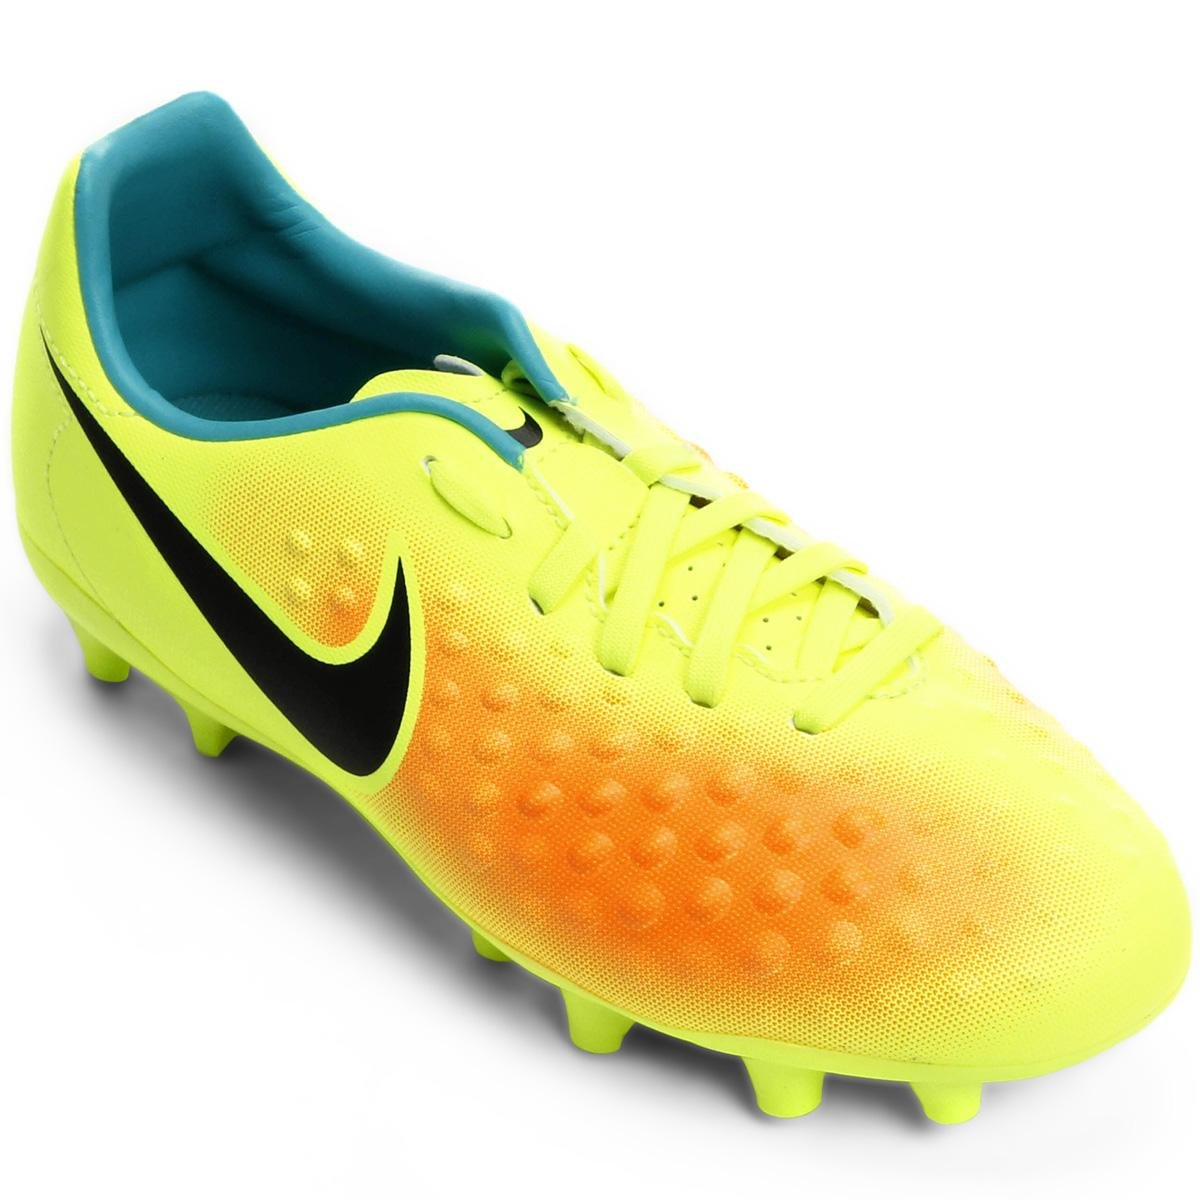 Chuteira Campo Infantil Nike Magista Opus II FG - Compre Agora ... 7e0a0b835e45d